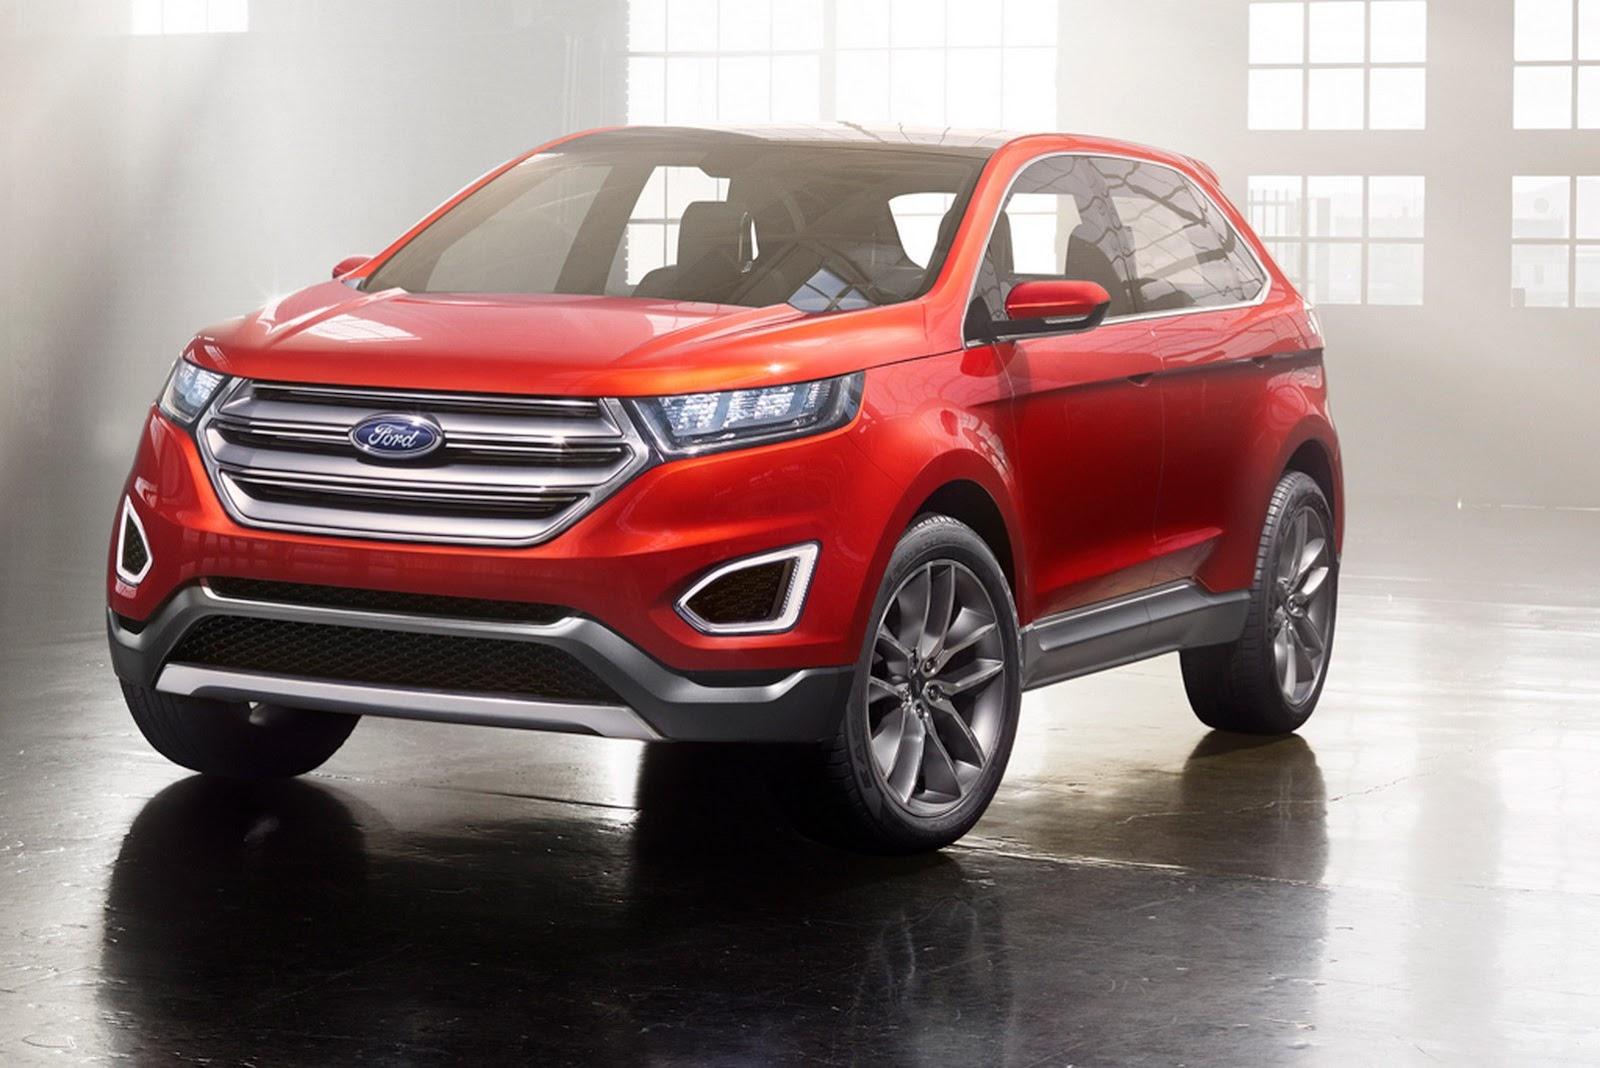 2015 ford edge image 3